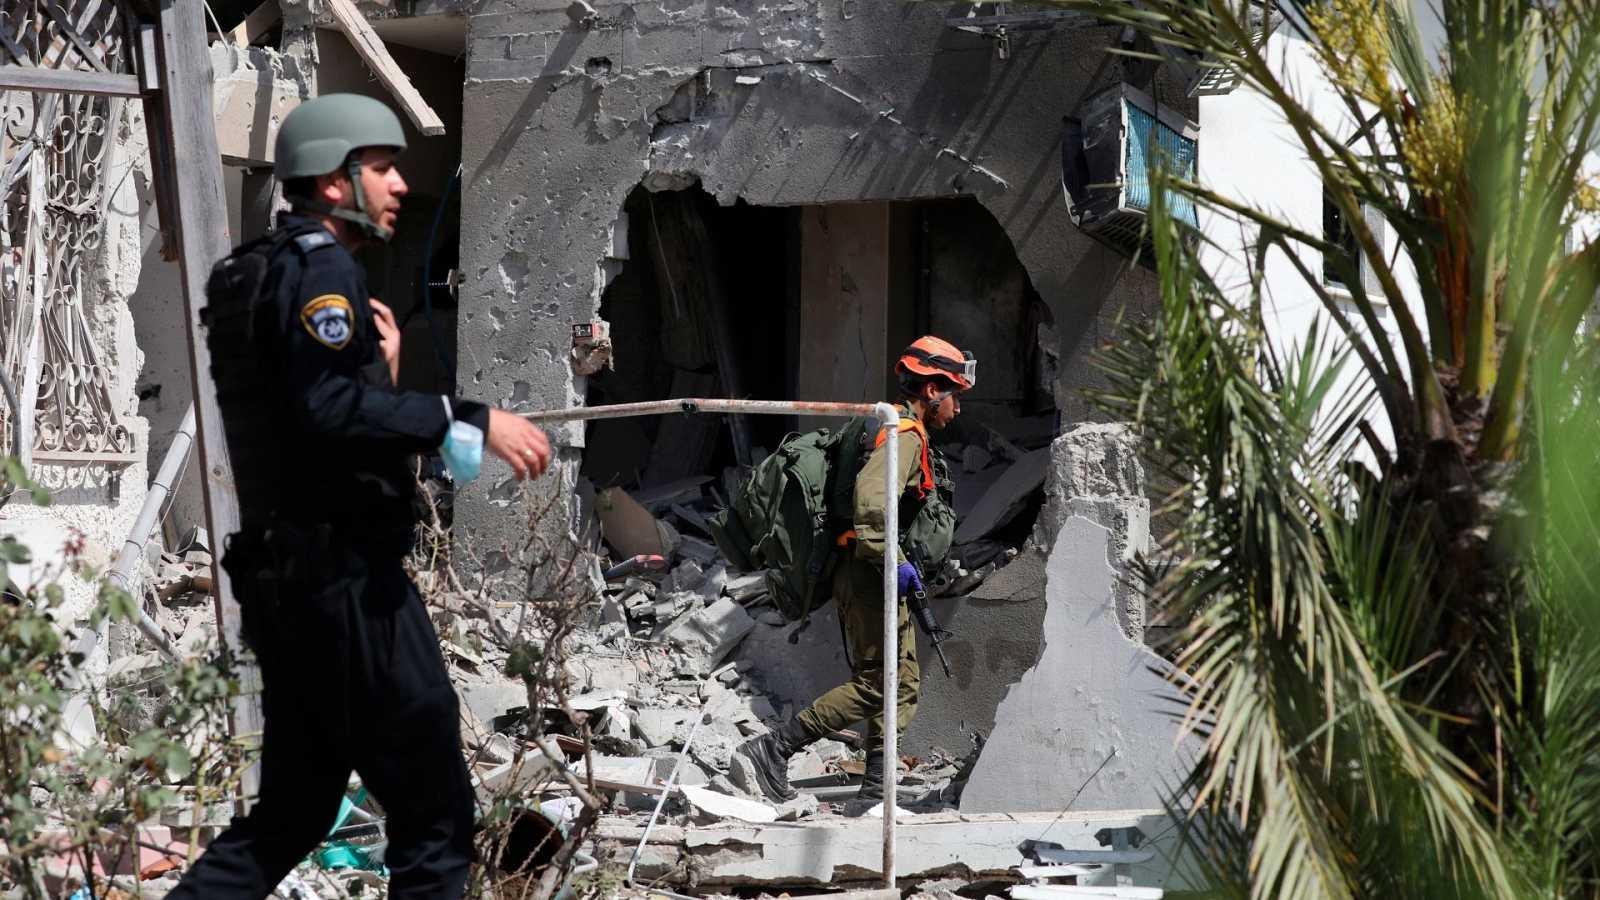 14 horas - Mueren dos israelíes por lanzamiento de cohetes palestinos - Escuchar ahora